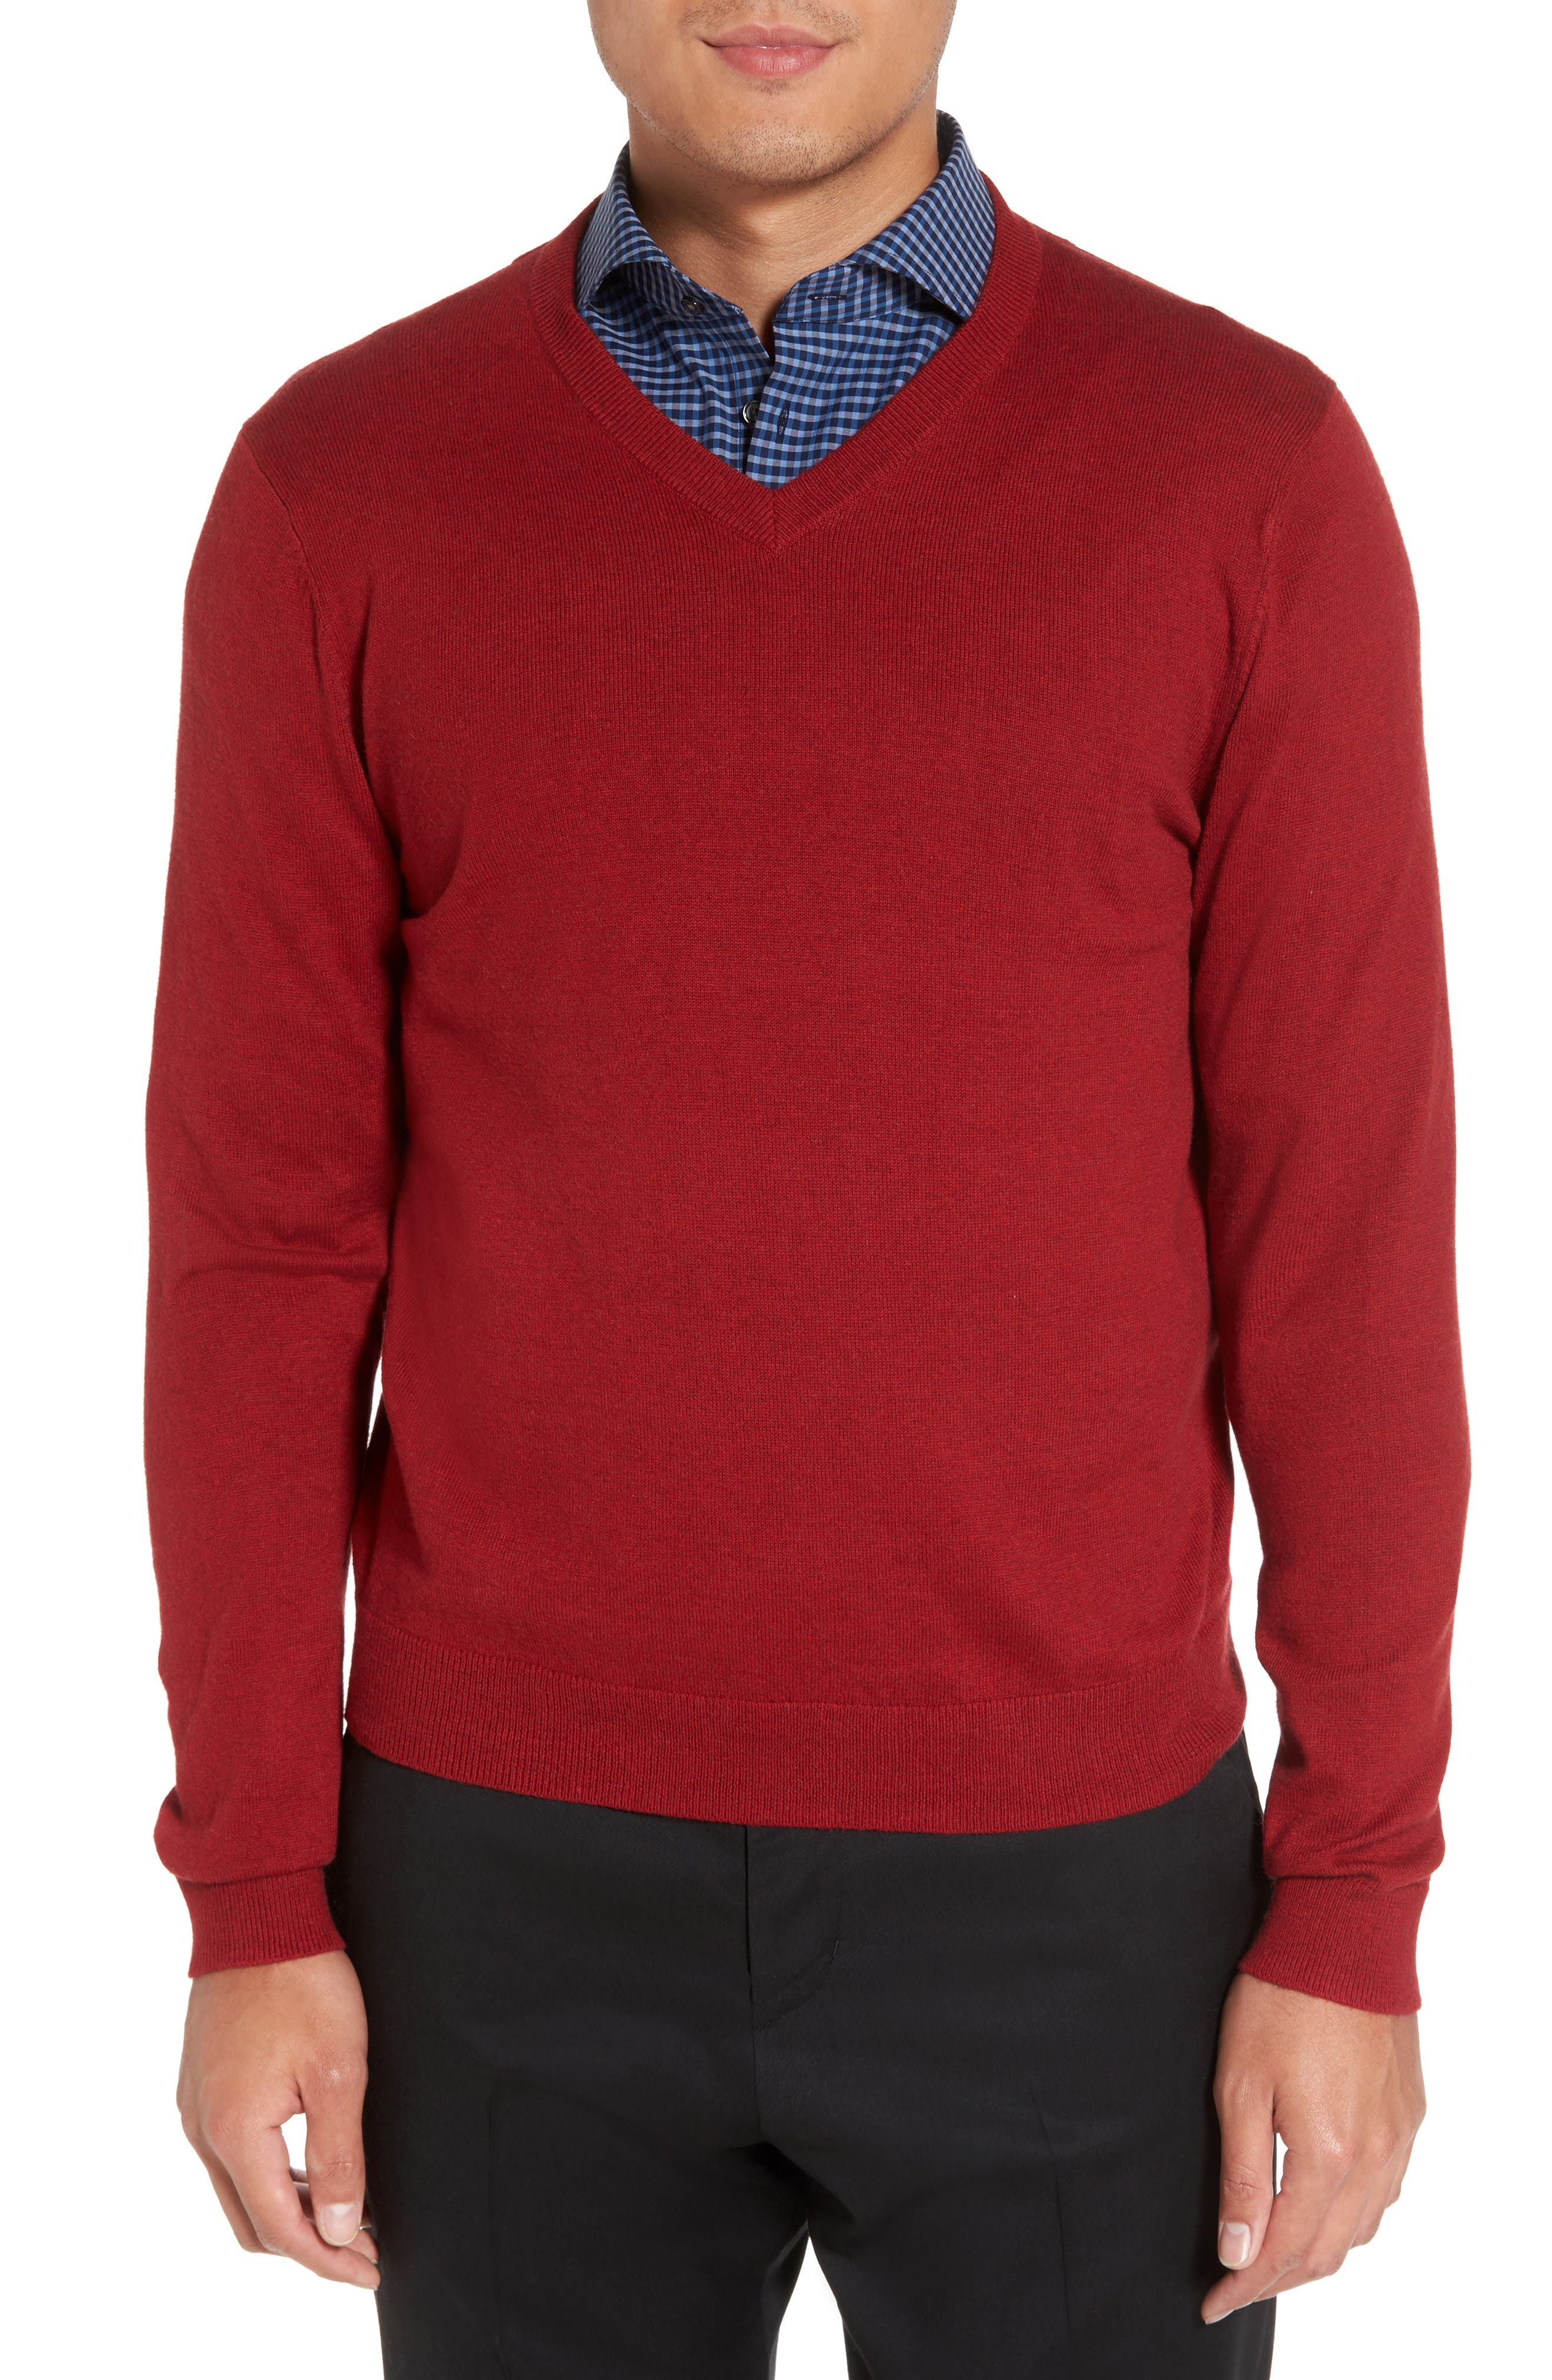 Main Image - Nordstrom Men's Shop Cotton & Cashmere V-Neck Sweater (Regular & Tall)